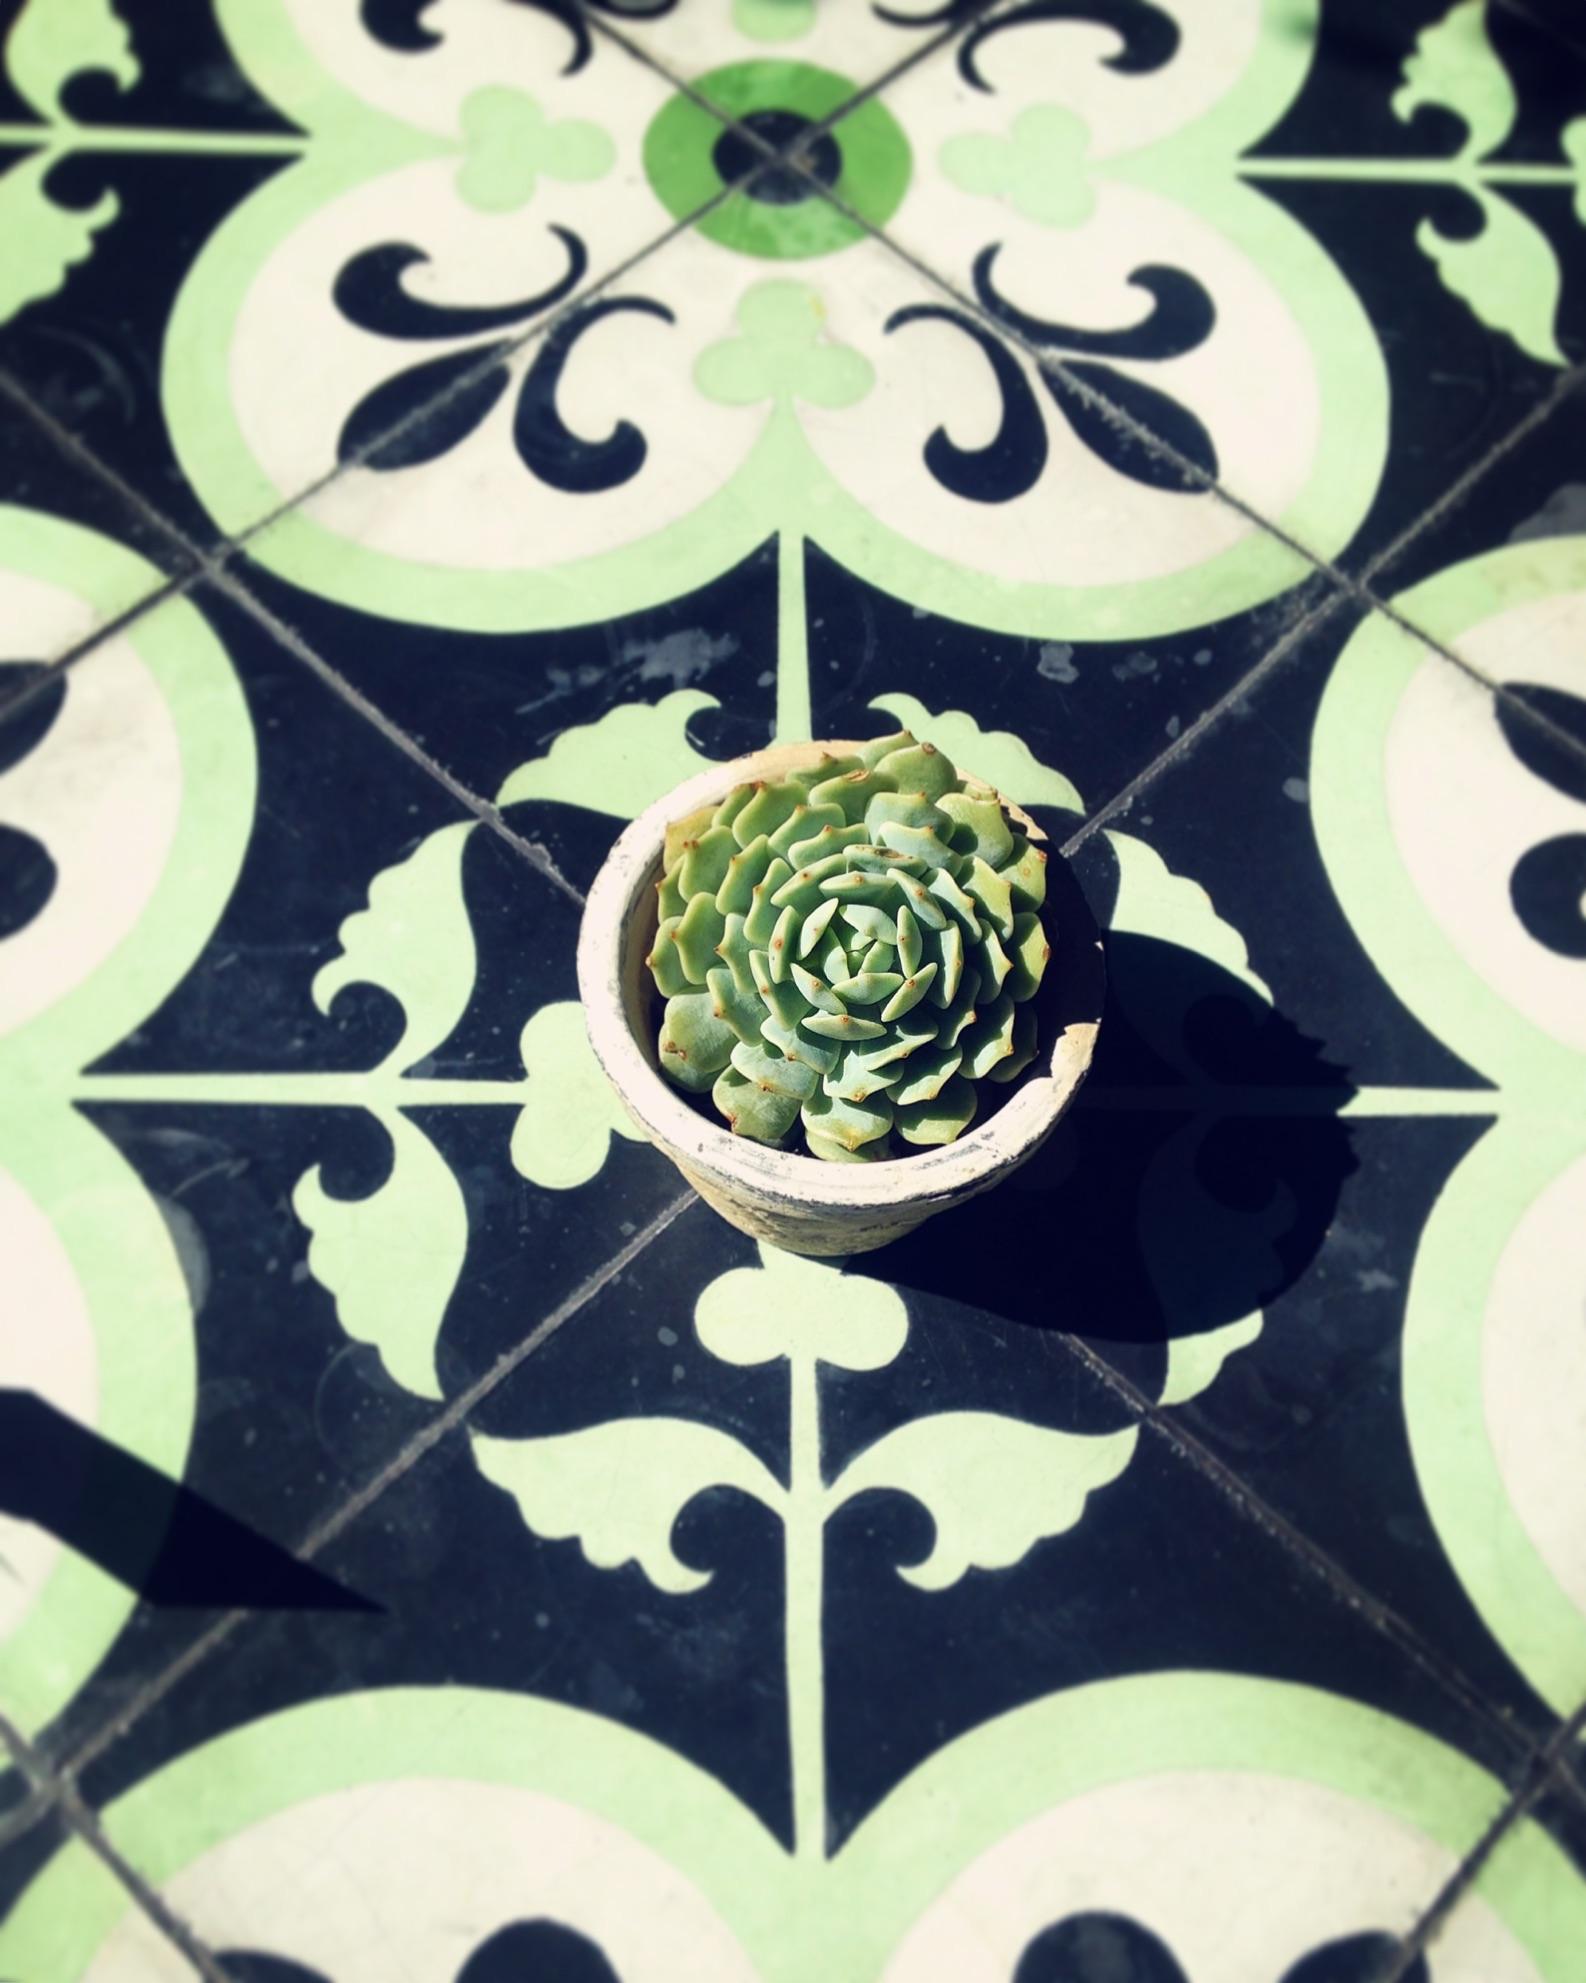 Succulent at cafe in tucson